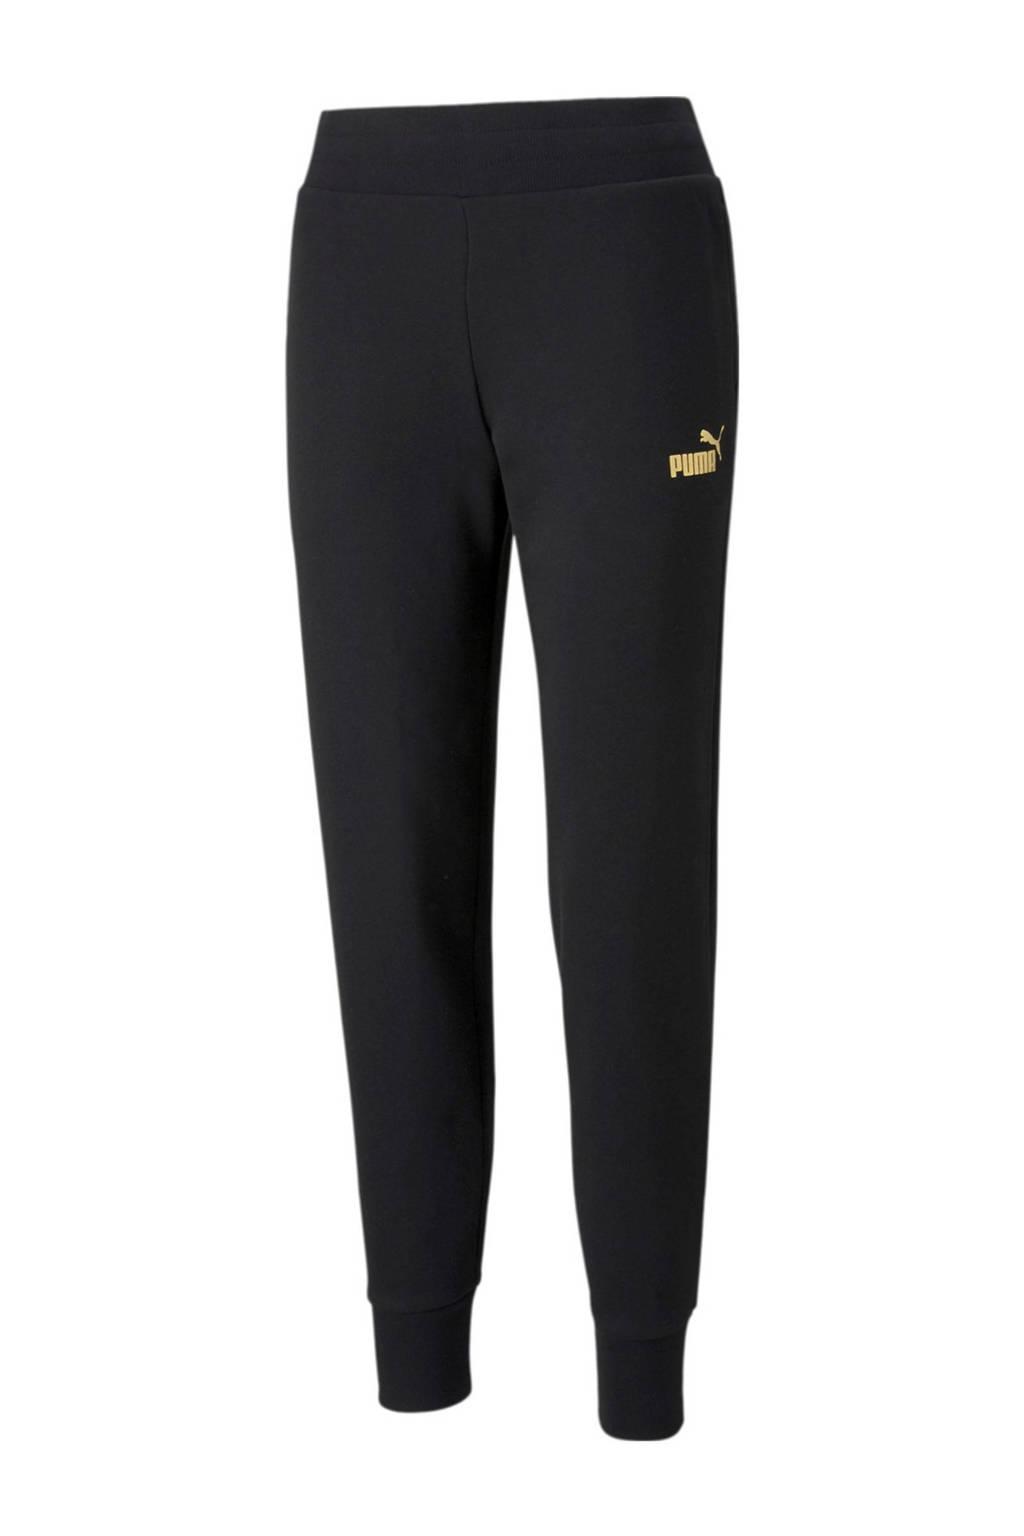 Puma regular fit broek met logo zwart/goud, Zwart/goud